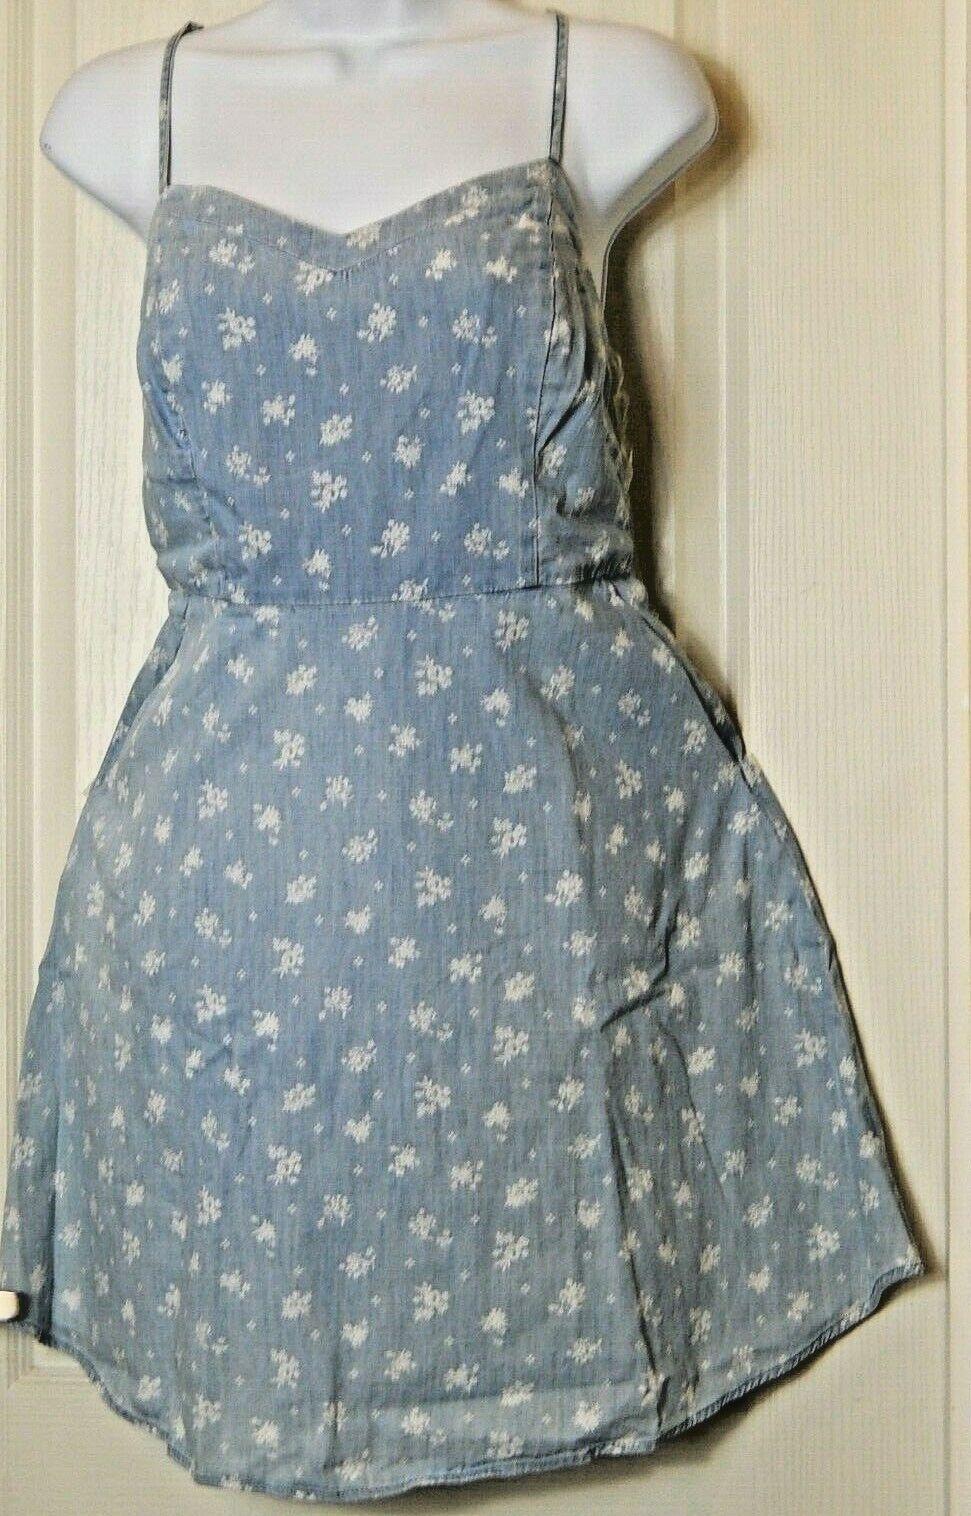 SO Women's Smocked Woven Open Back Dress Size Large Summer / Beach Dress - $18.14